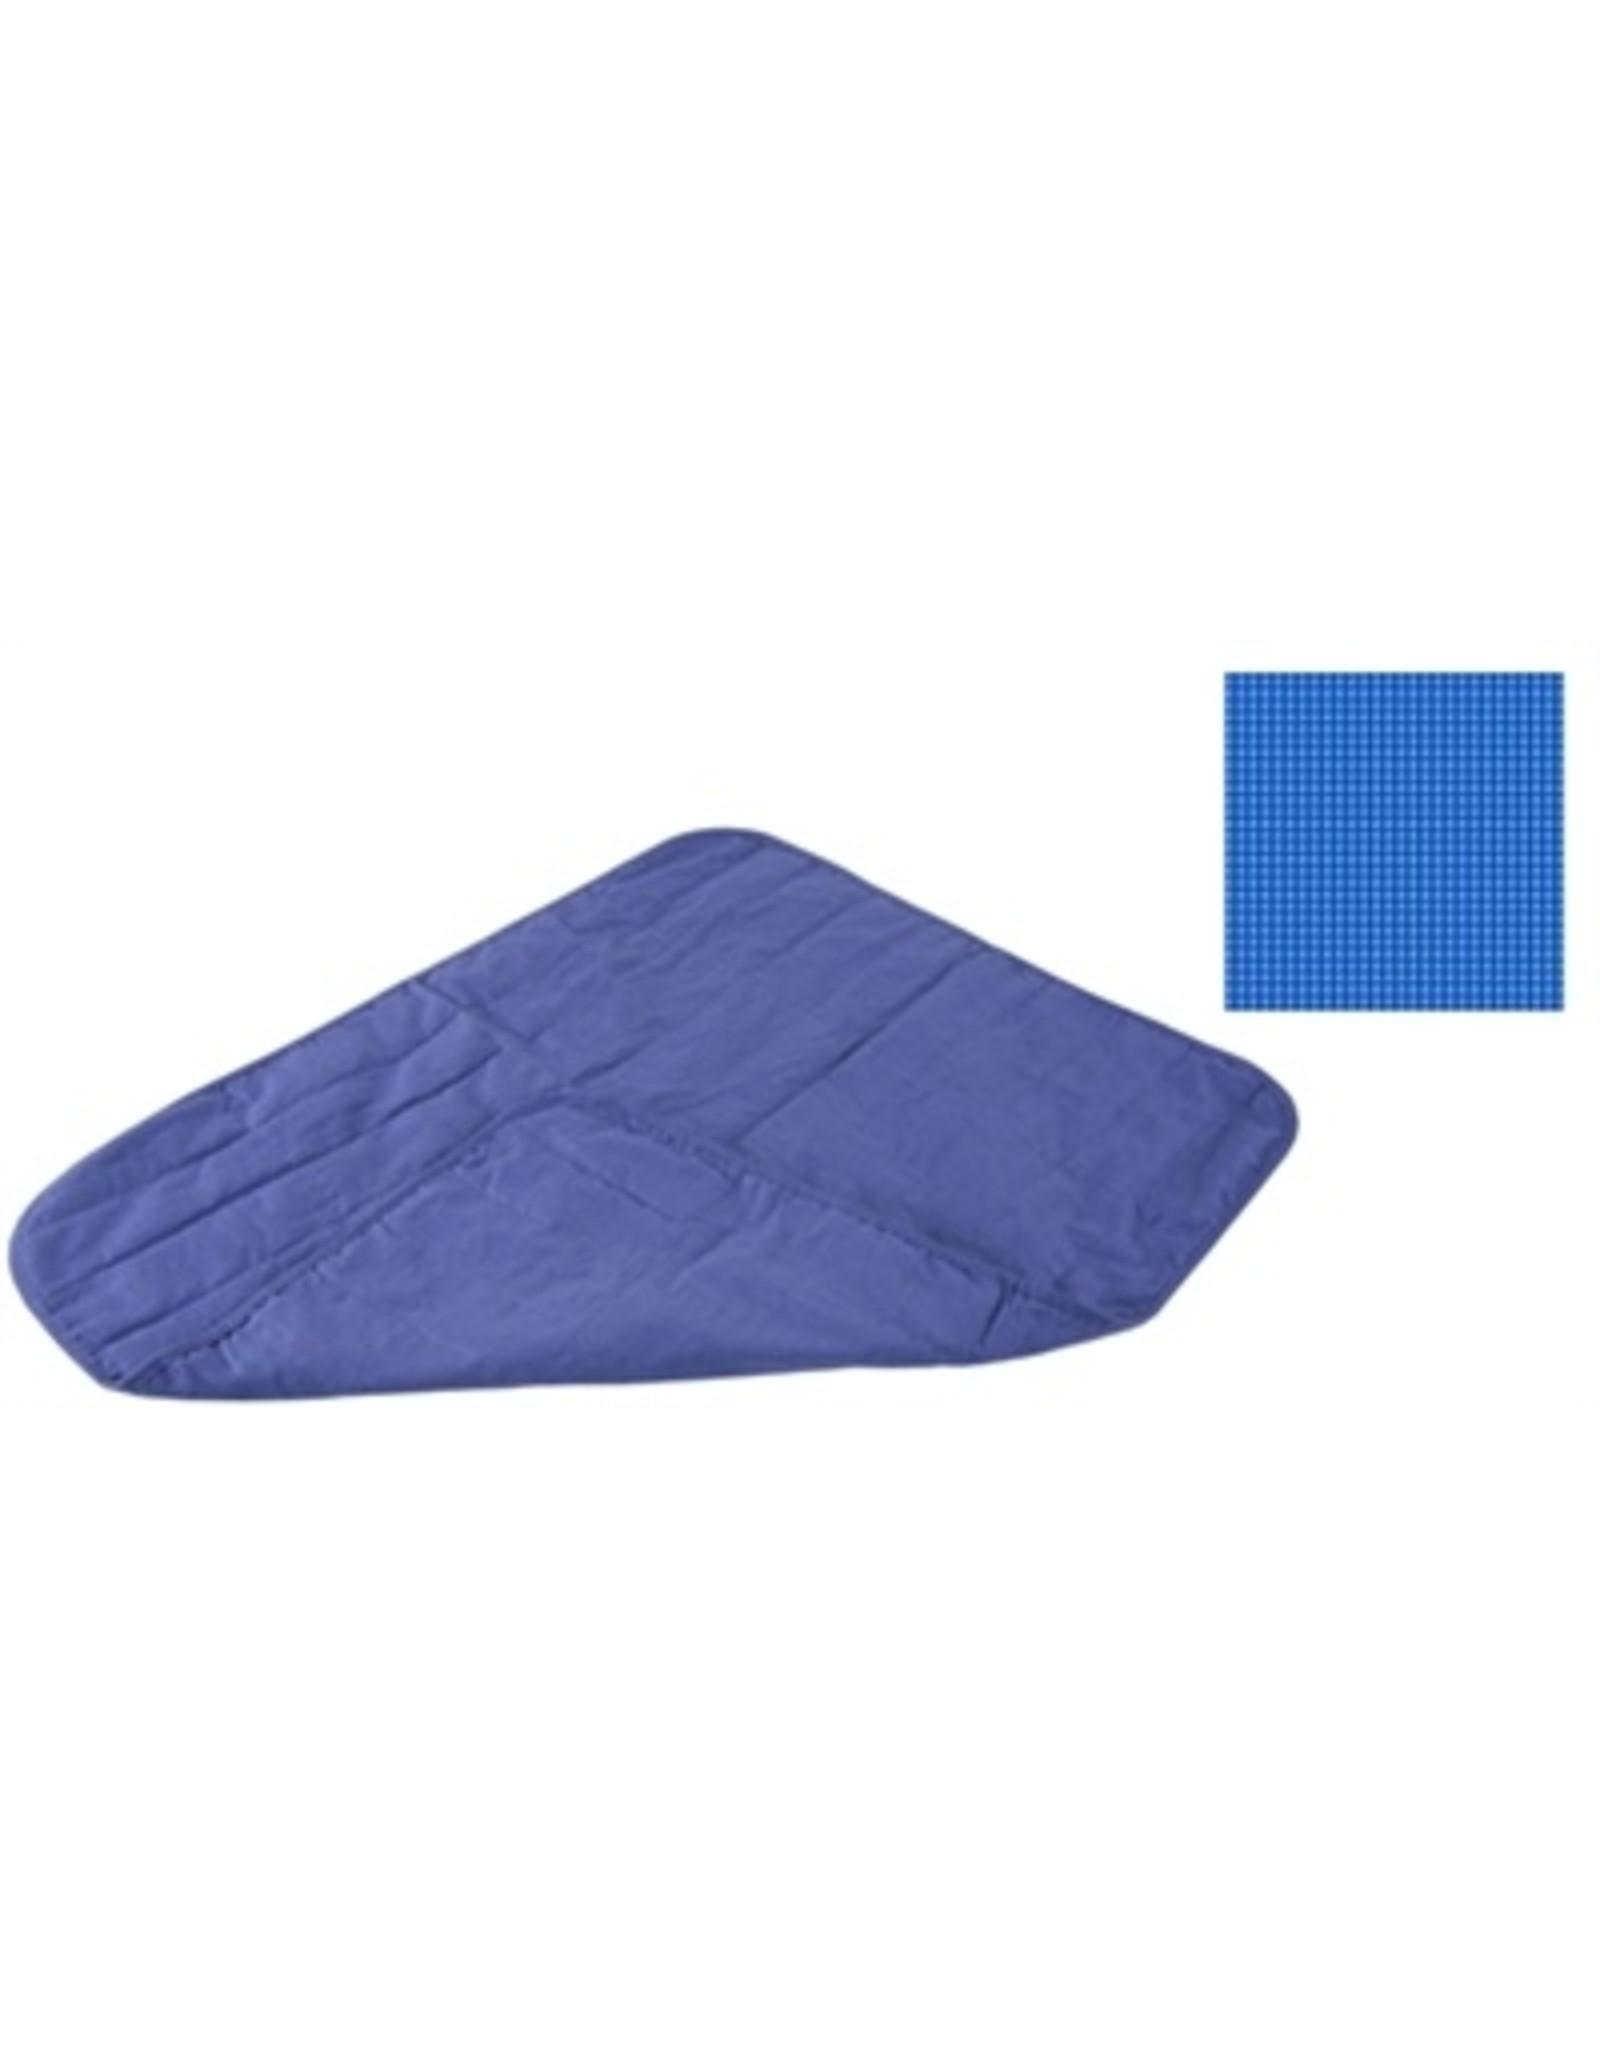 Aqua coolkeeper Mat aqua coolkeeper pacific blue